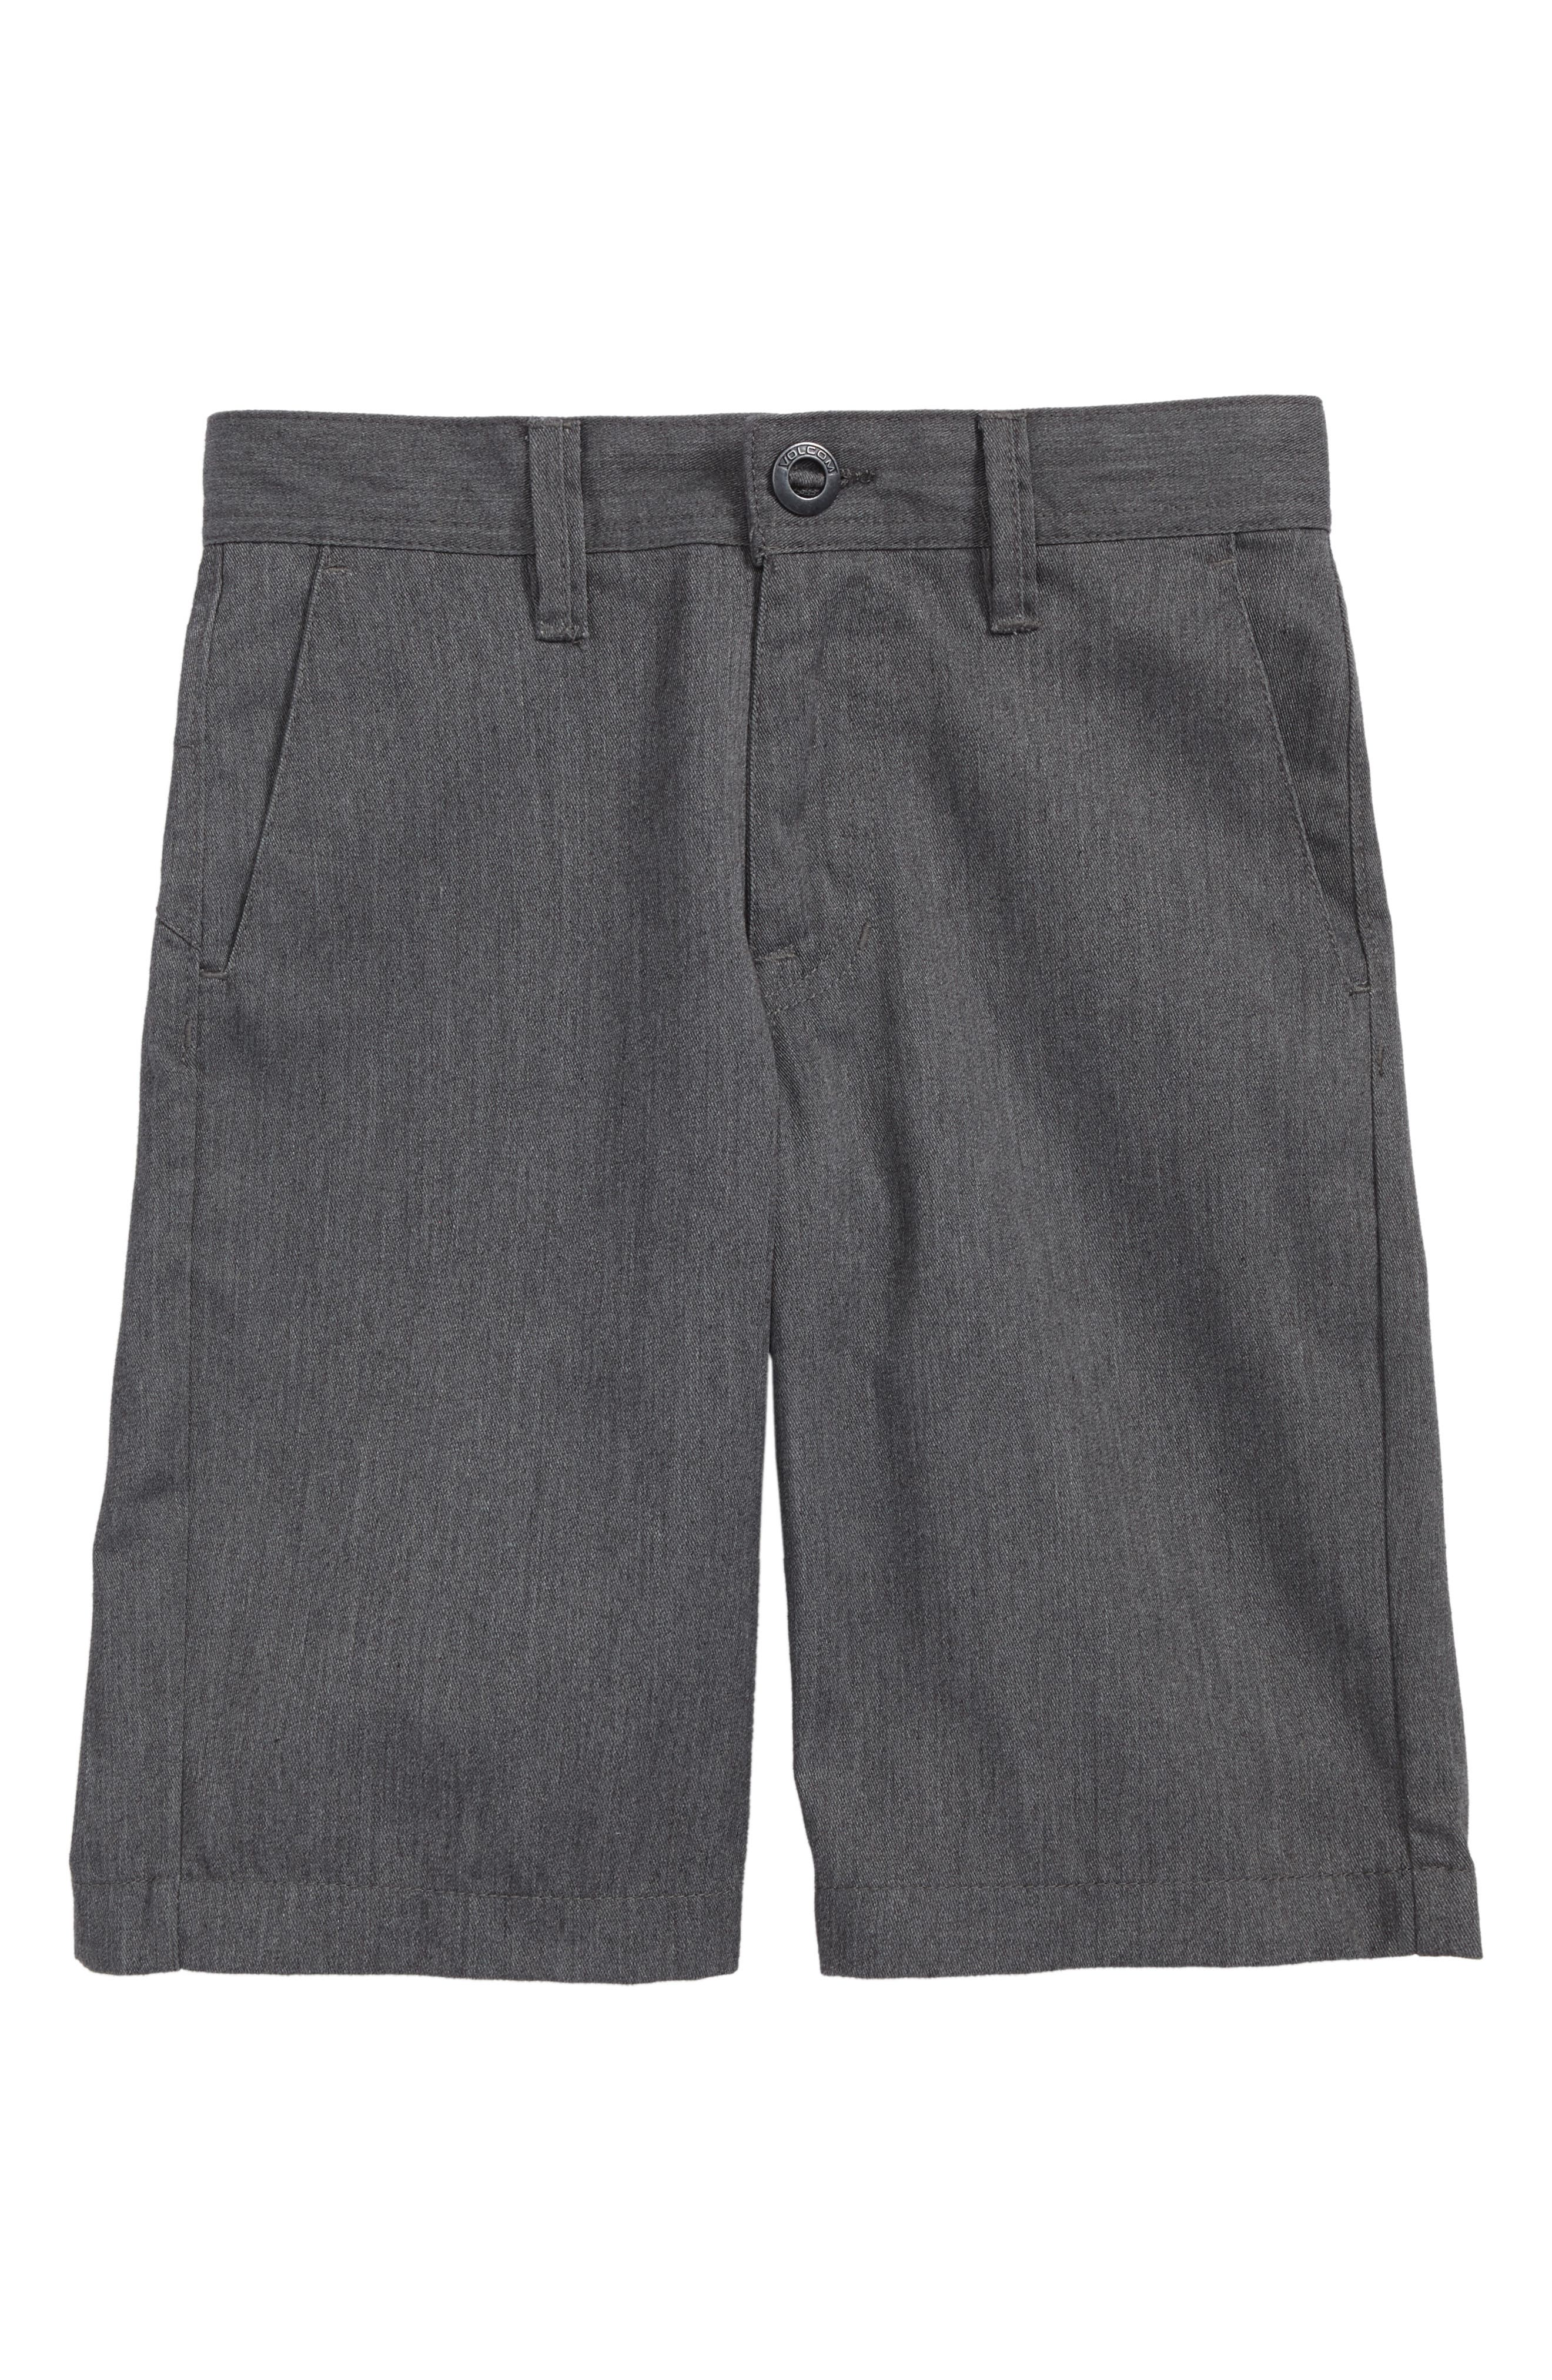 Chino Shorts,                         Main,                         color, CHARCOAL HEATHER